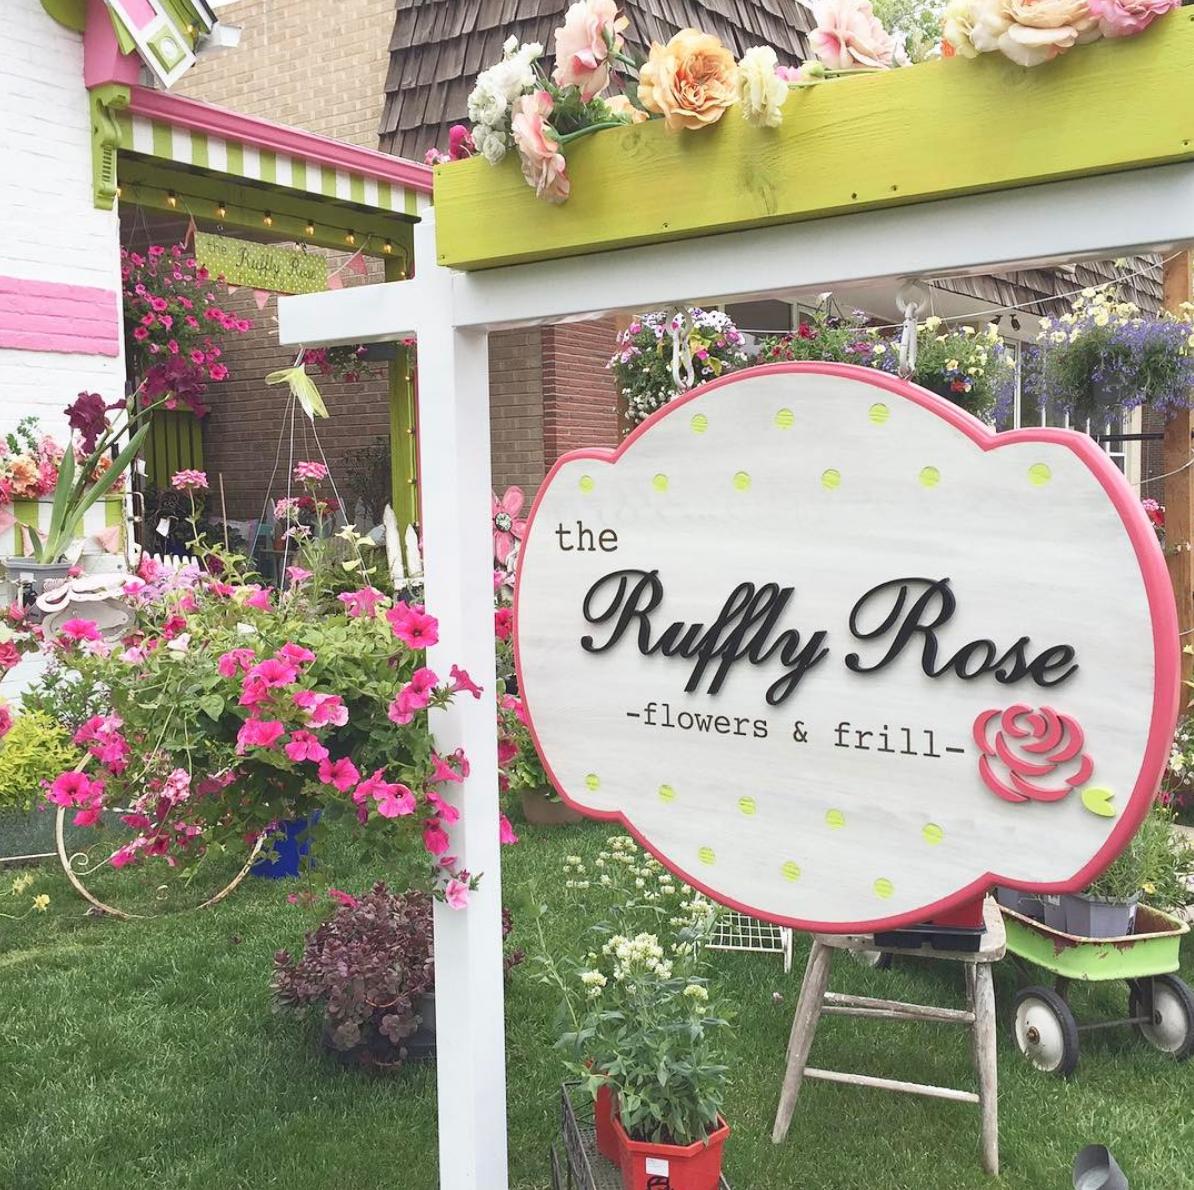 via The Ruffly Rose IG